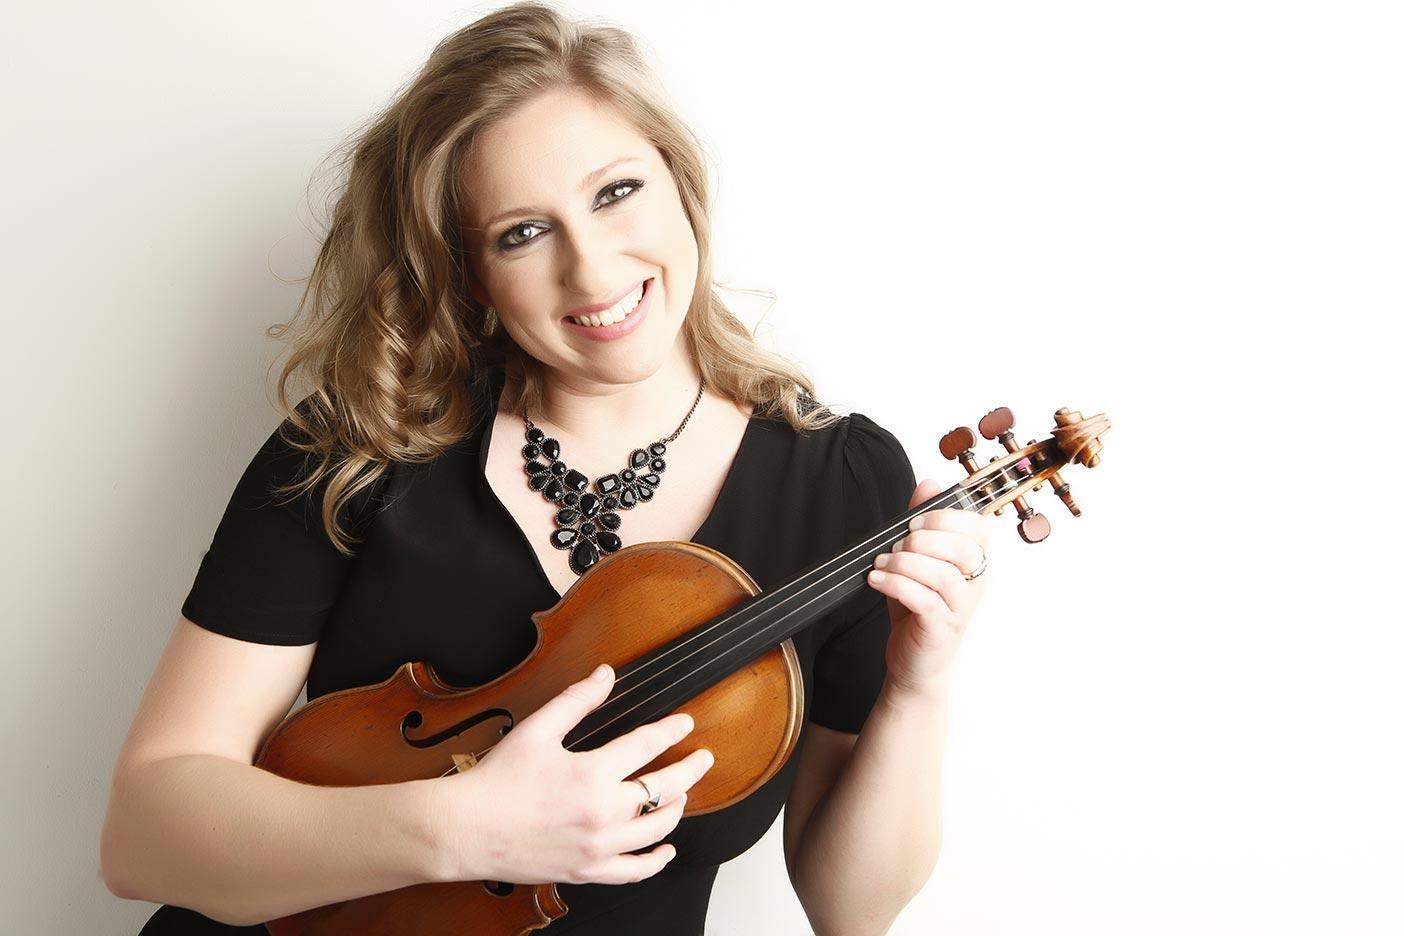 Seonaid Aitken posing with Violin